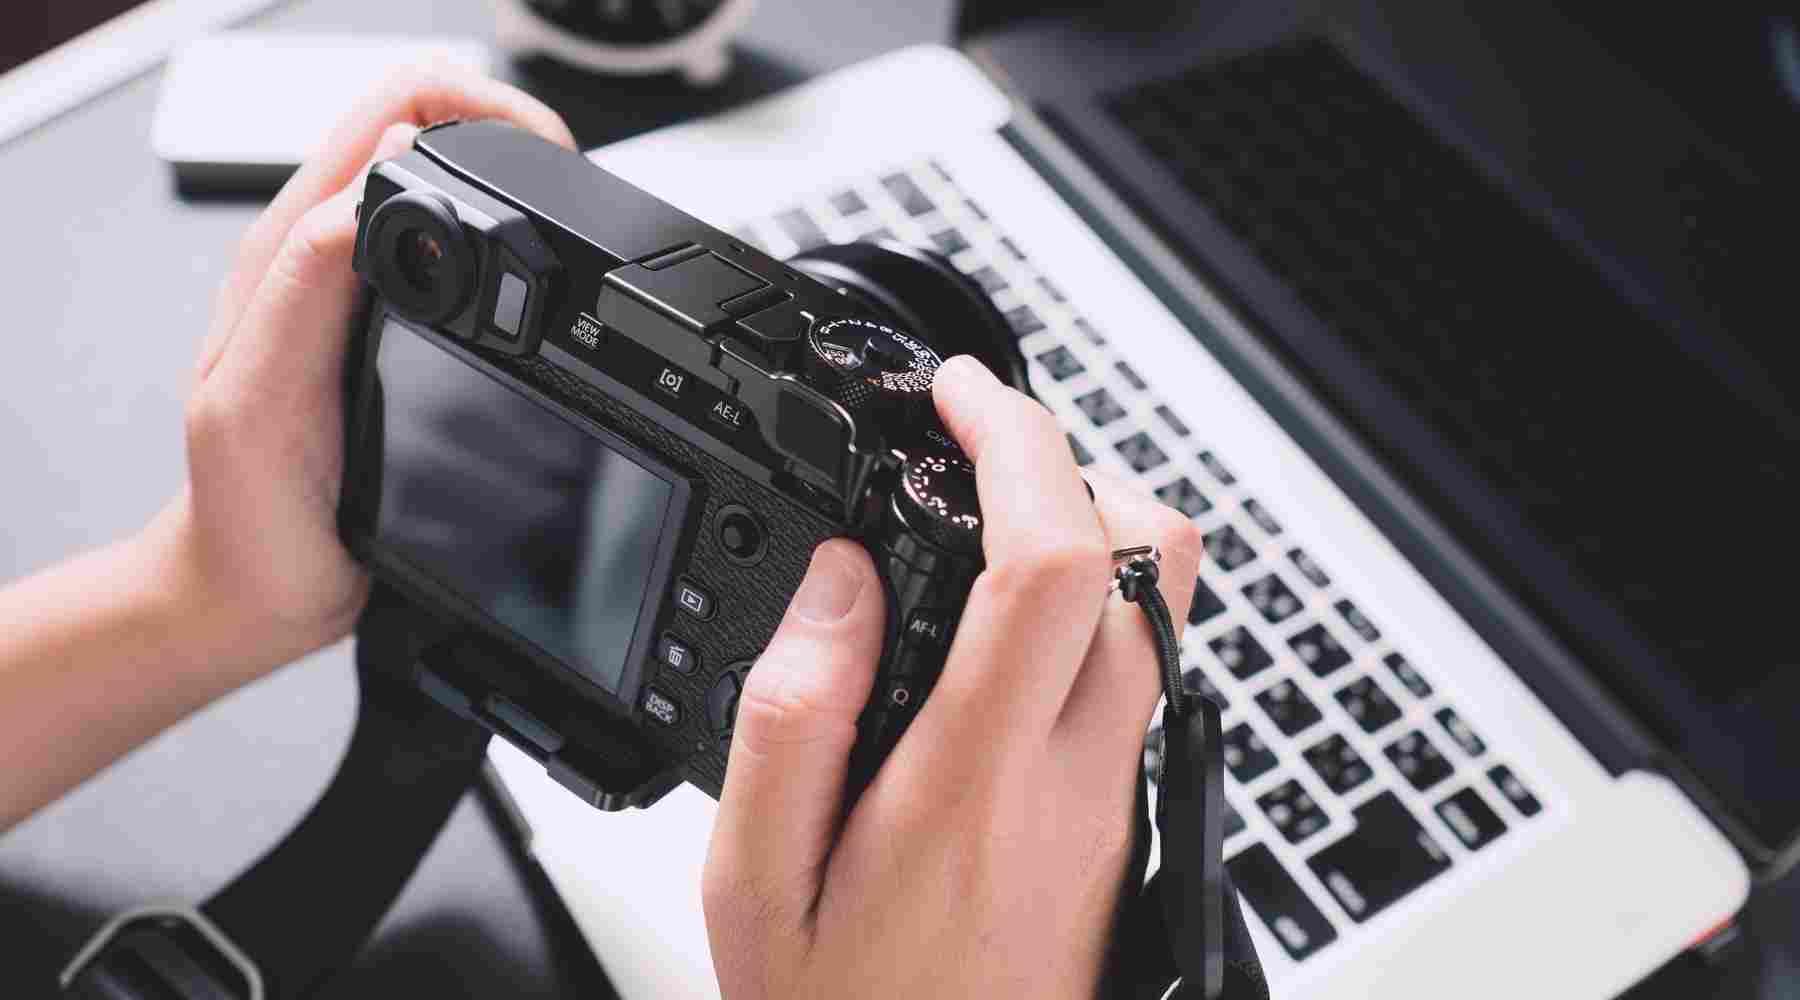 Hobbies that Make Money - Photography